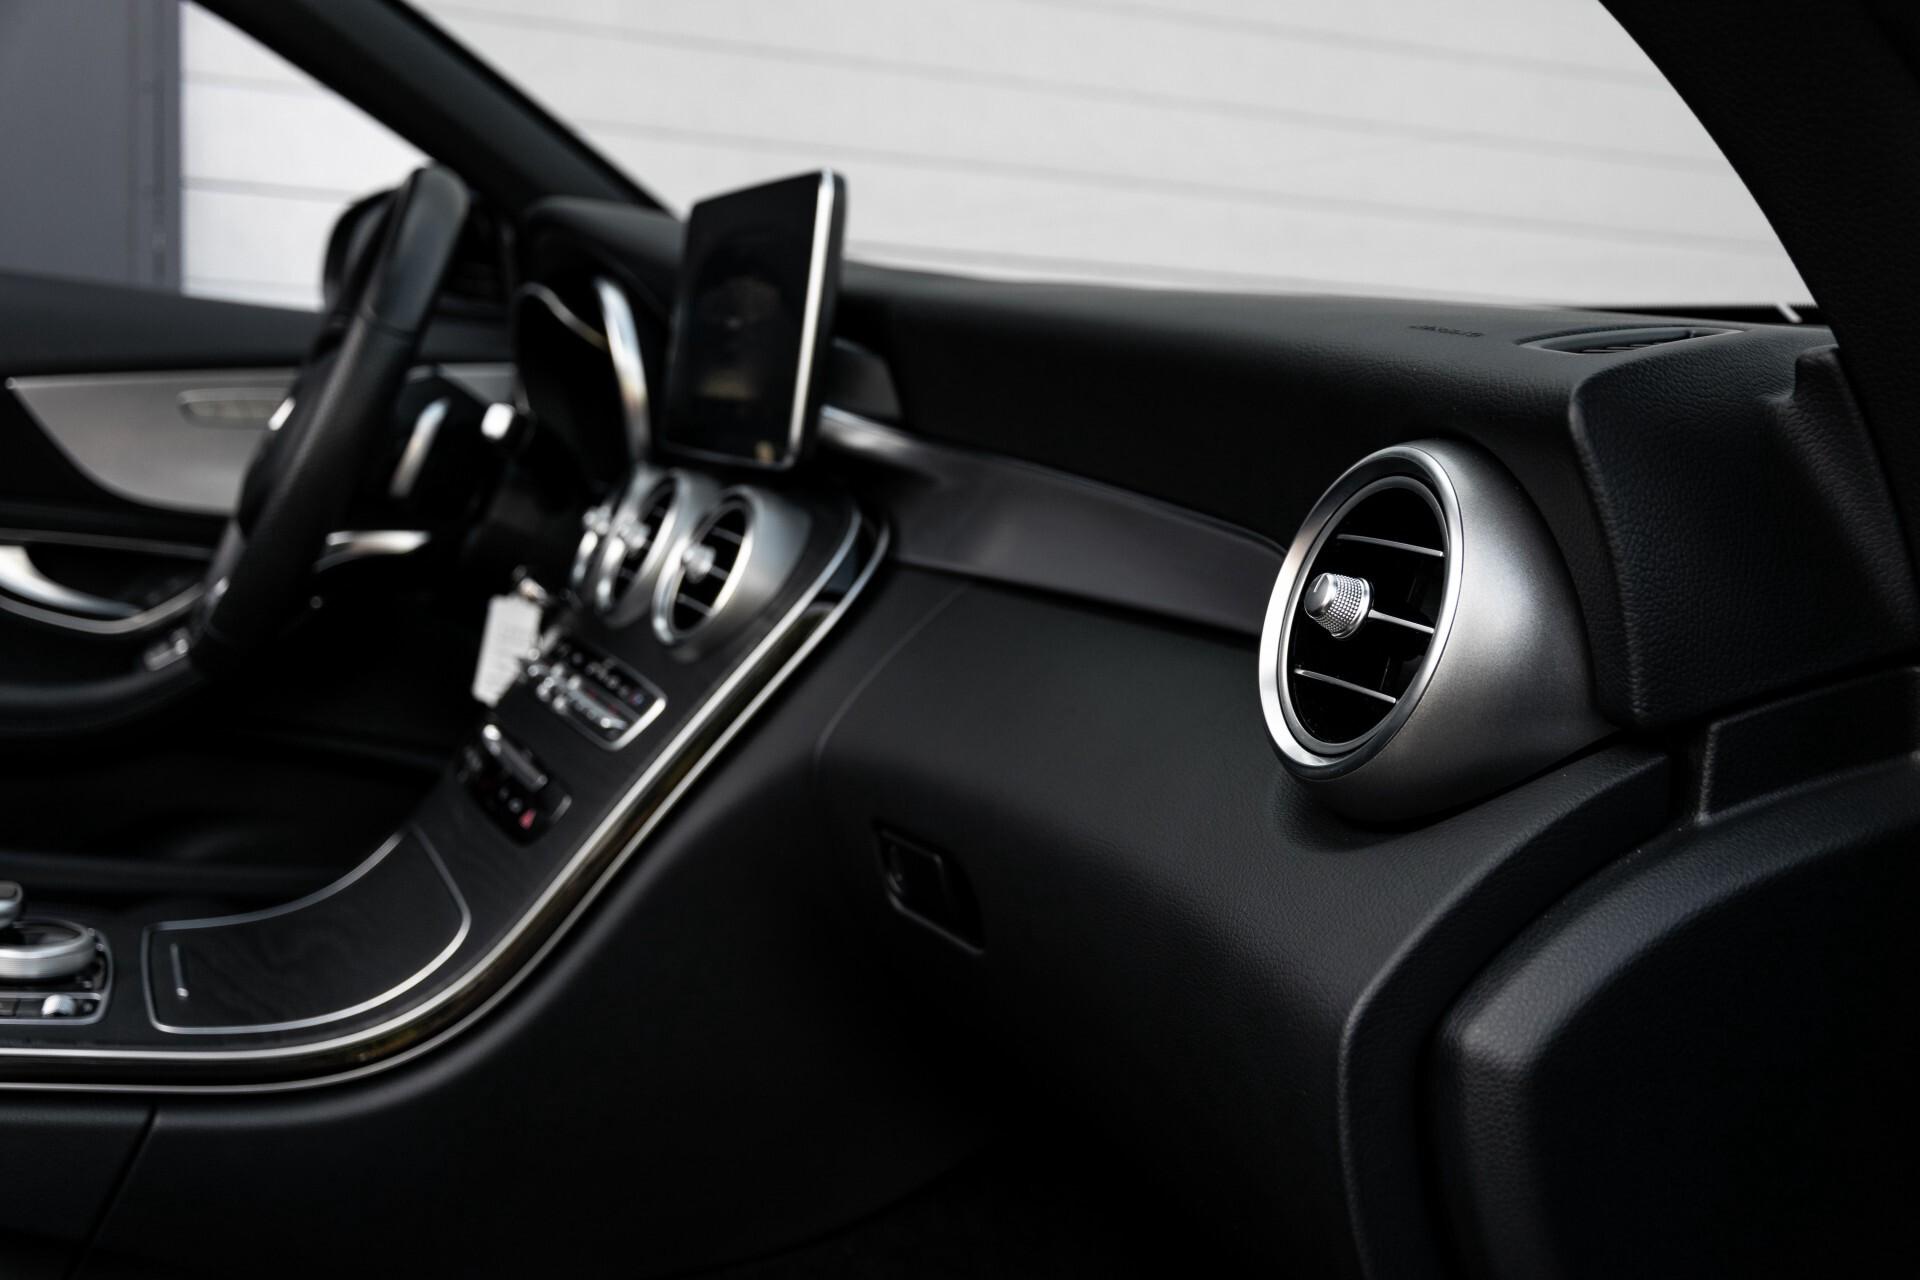 Mercedes-Benz C-Klasse Cabrio 250 AMG Airscarf/Aircap/Comand/ILS/Camera/Rode cabriokap Aut9 Foto 45